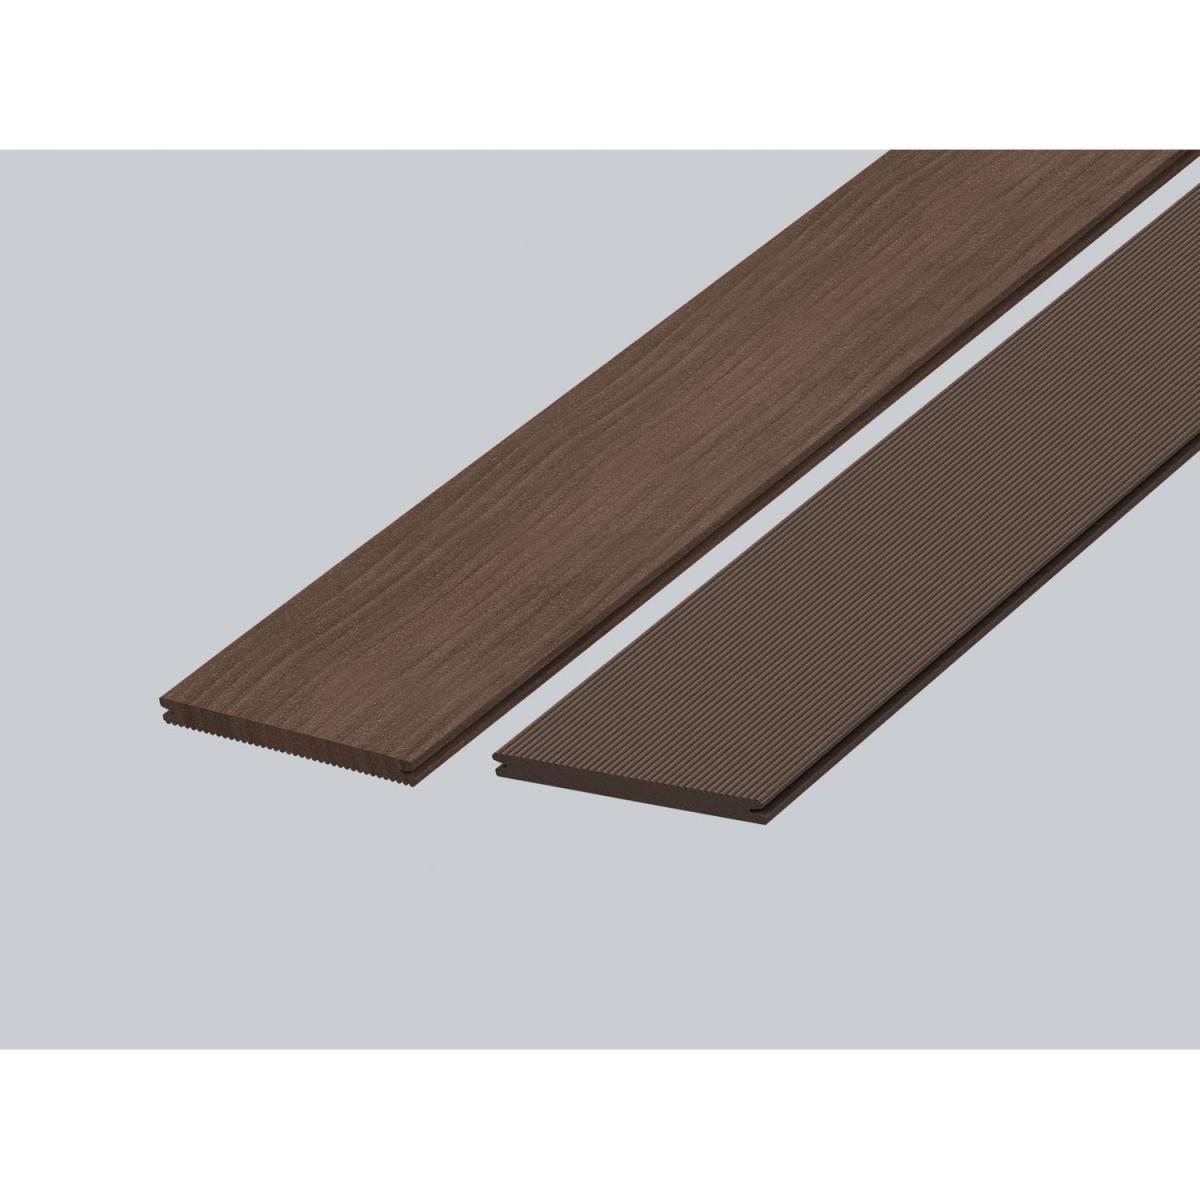 "Rettenmeier Terrassendiele ""Artwood GCC"" braun, 163x16x3000 mm 300x16,3 cm"